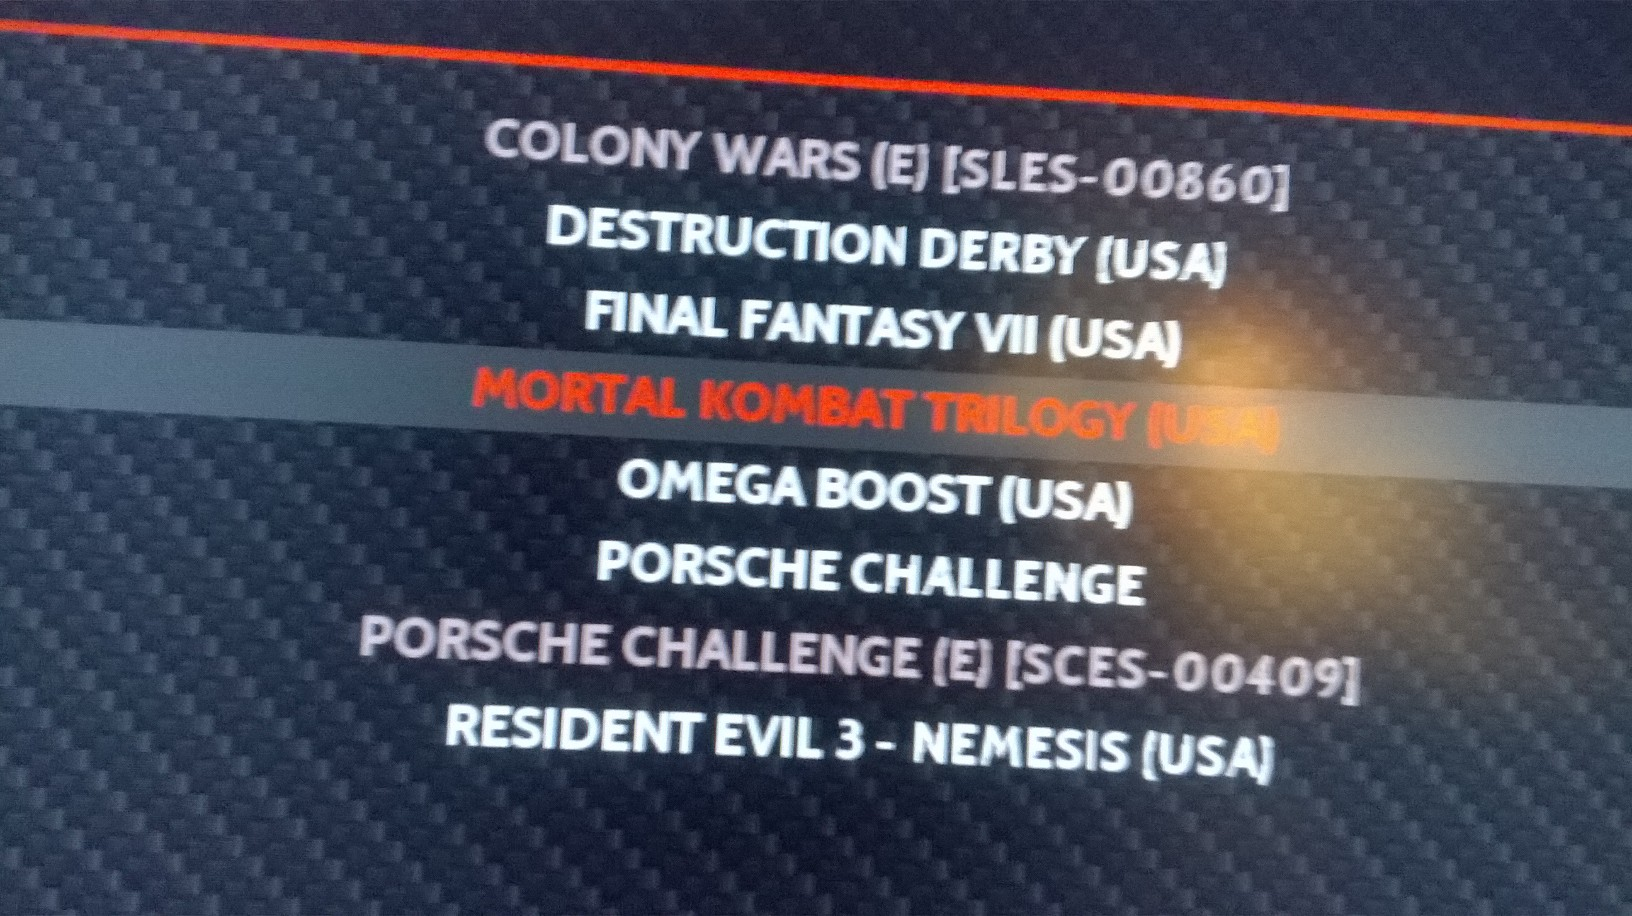 Playstation games not booting on retropie 4 2 - RetroPie Forum